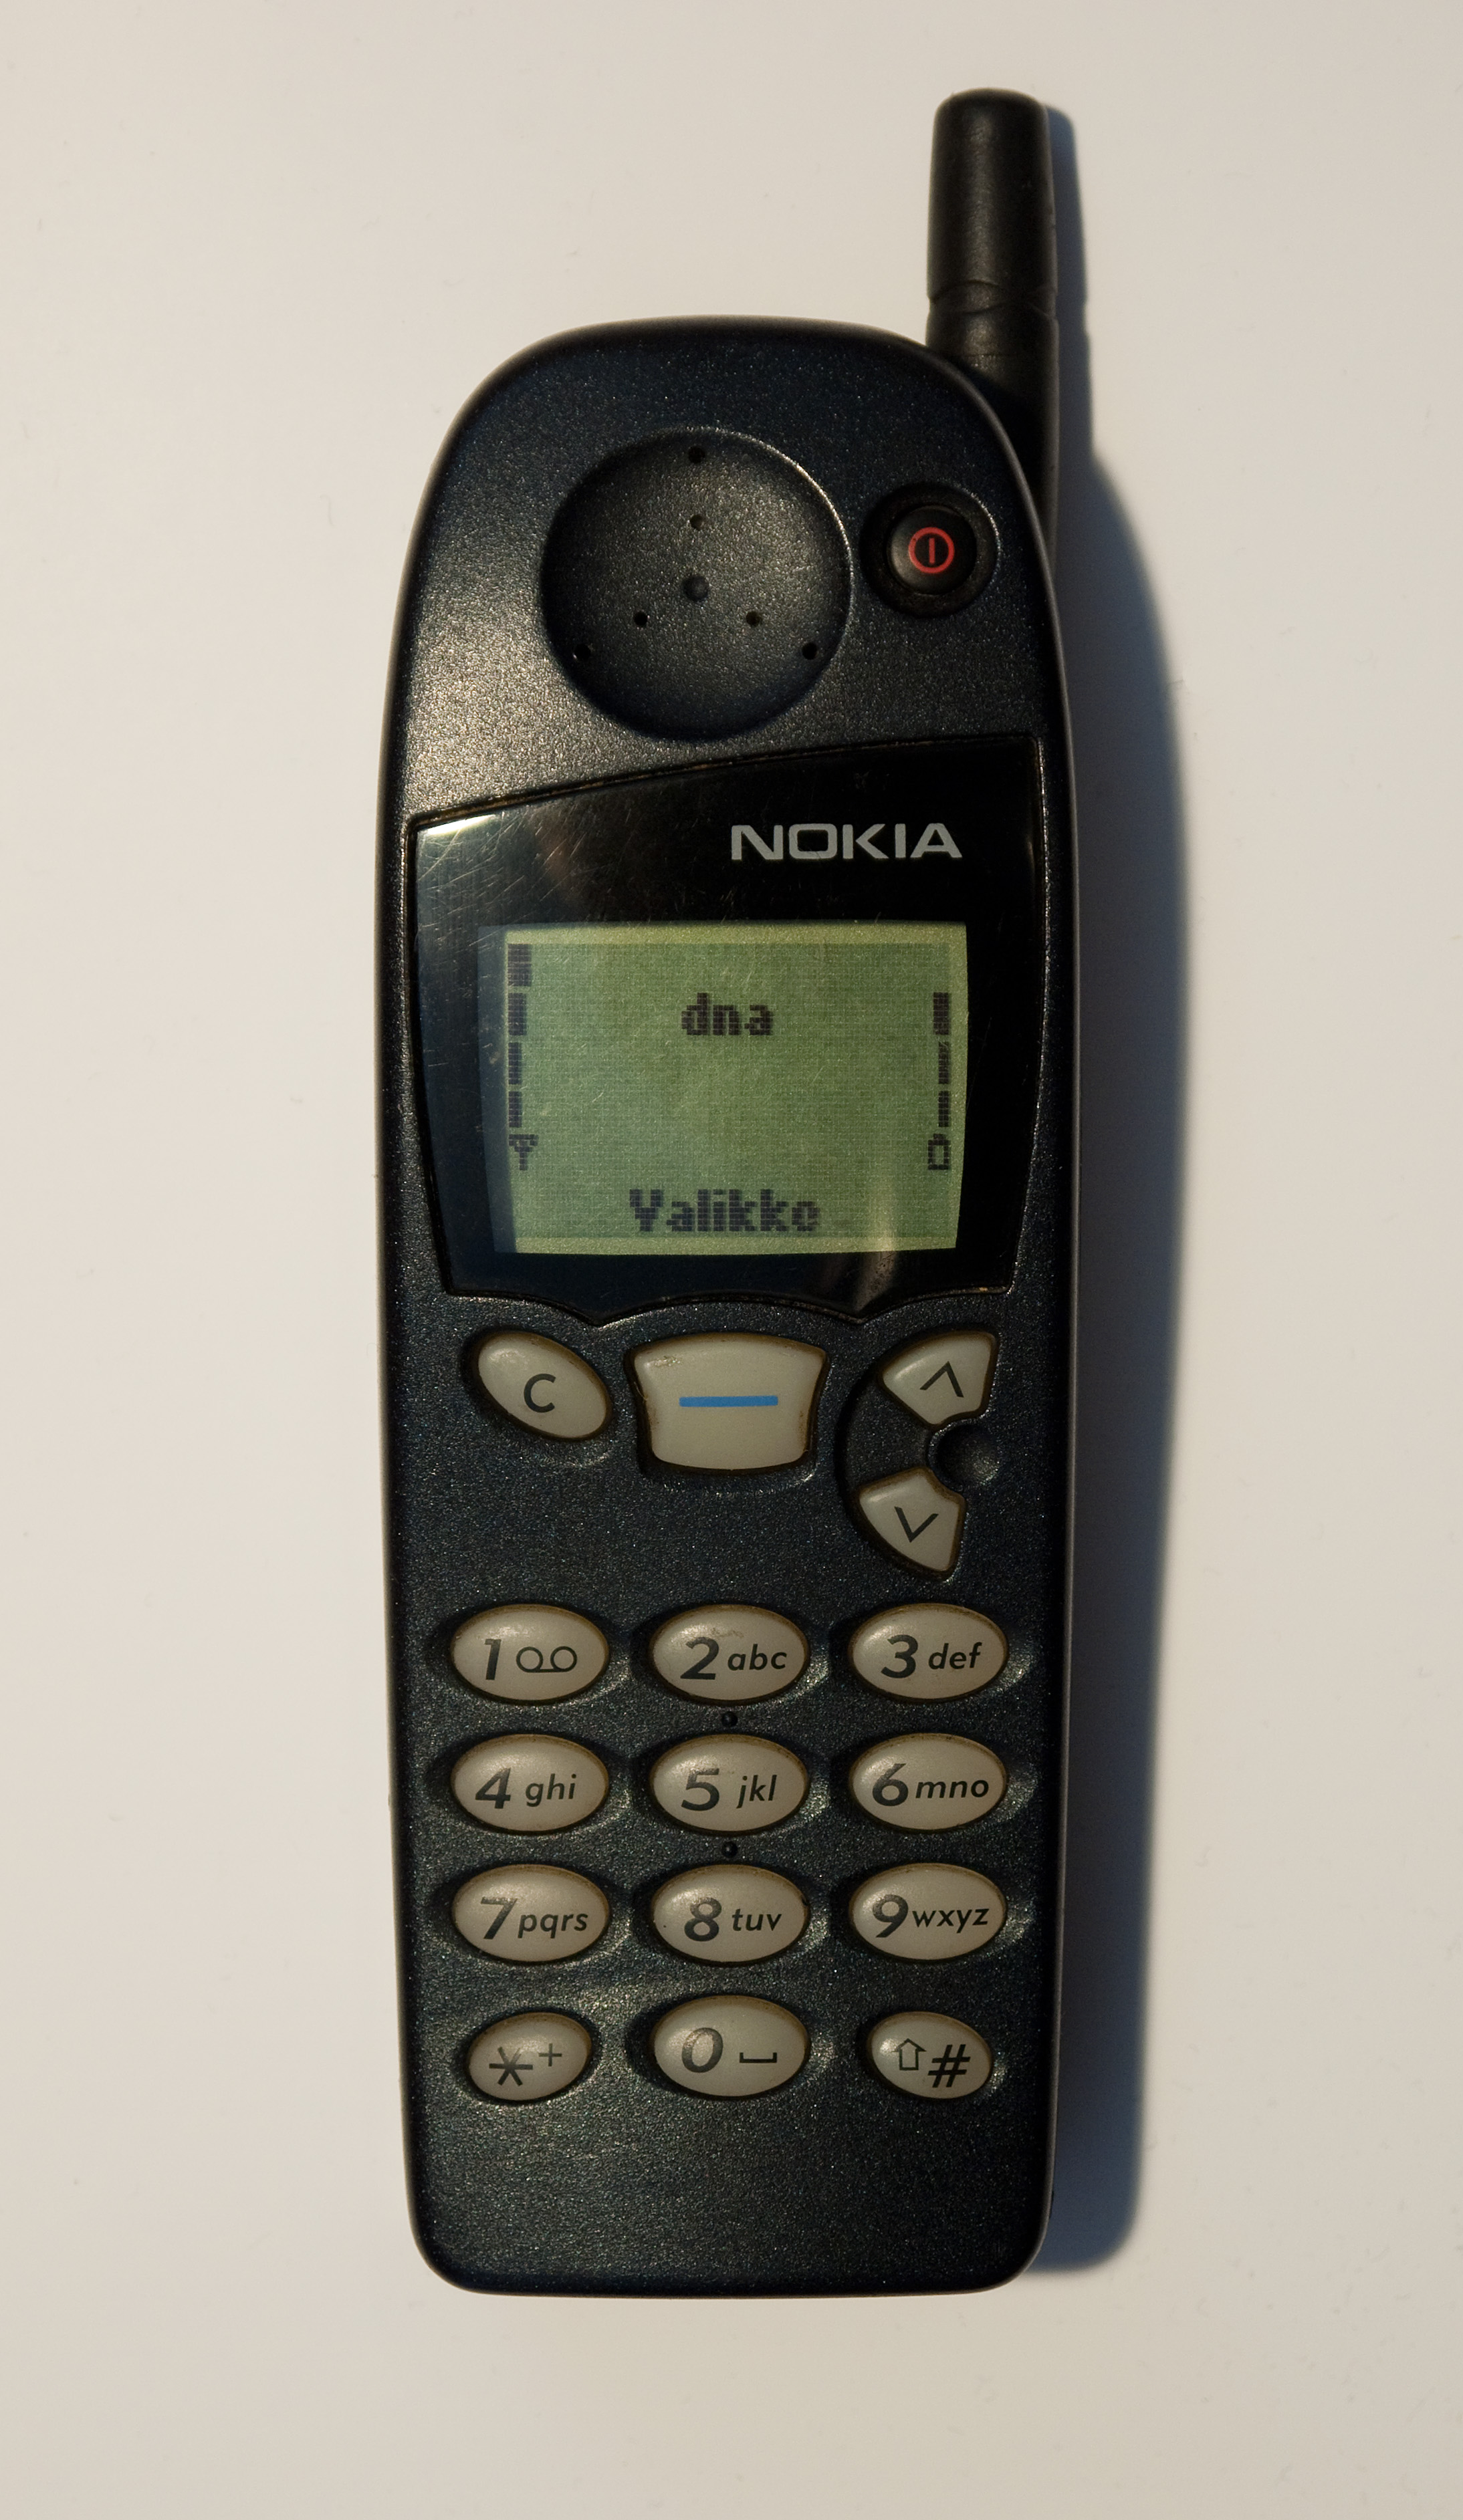 Nokia 5110 phone model